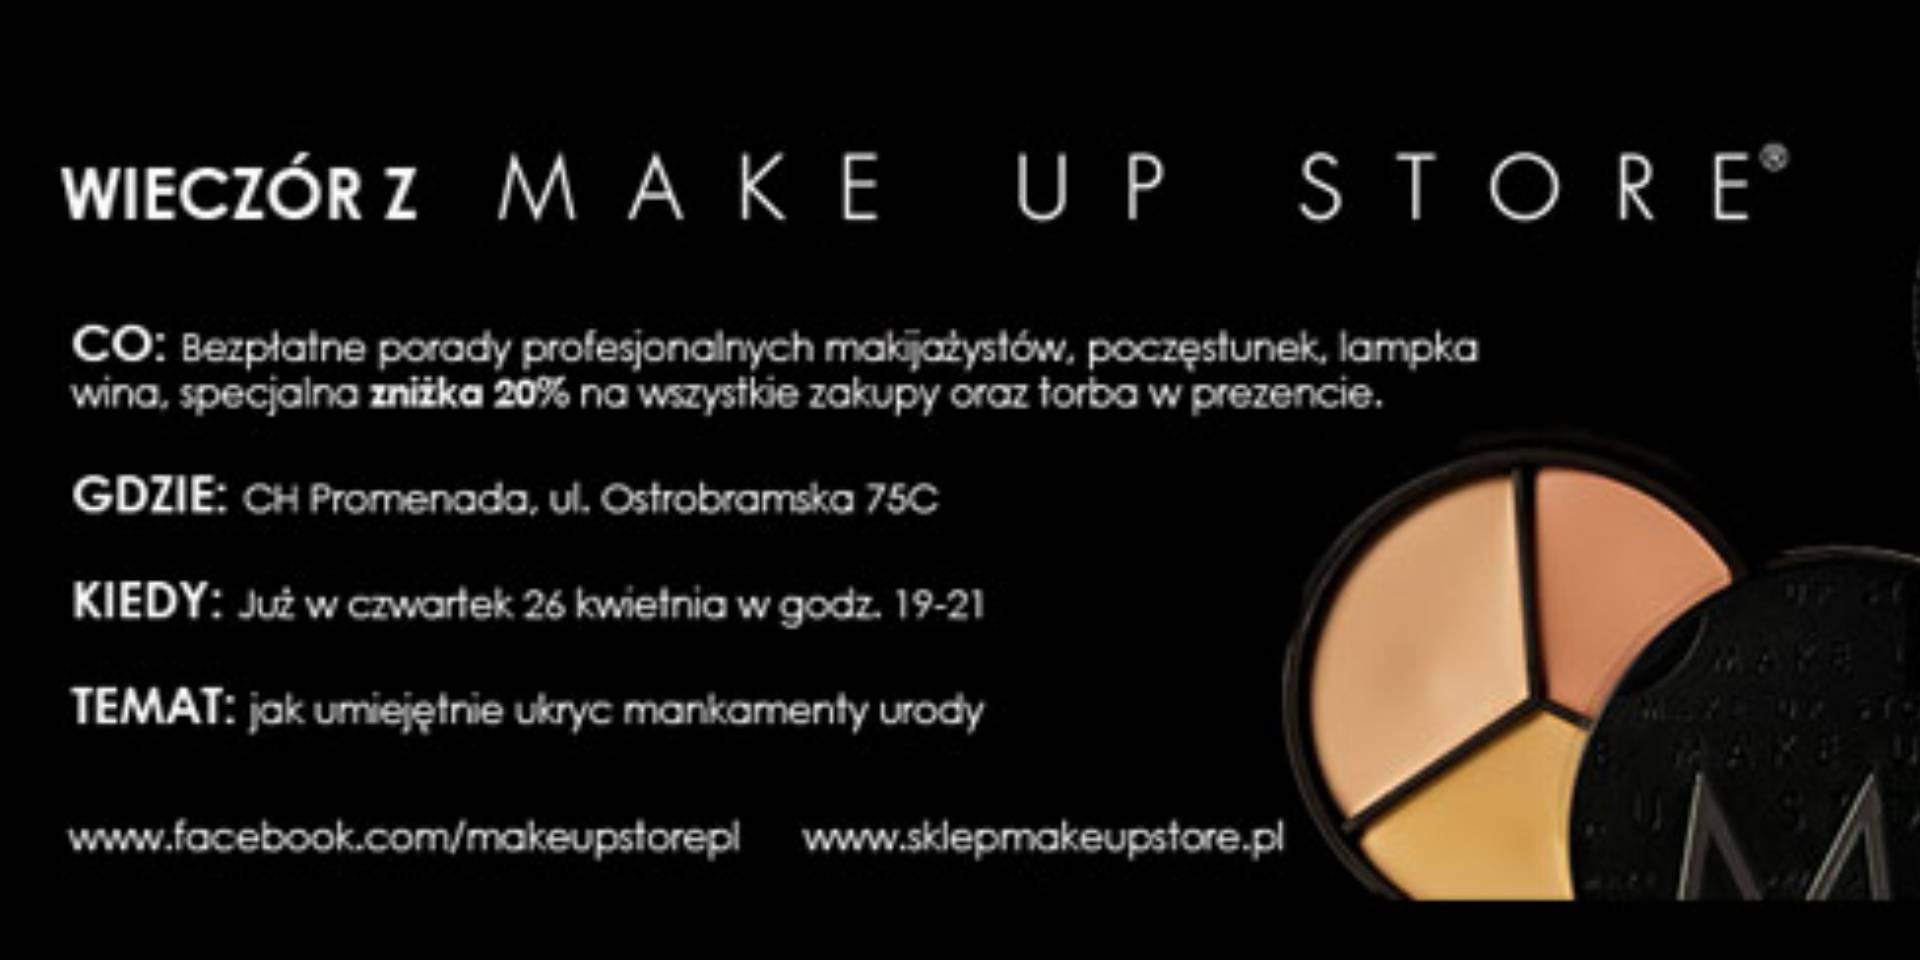 make-up-store-zaproszenie